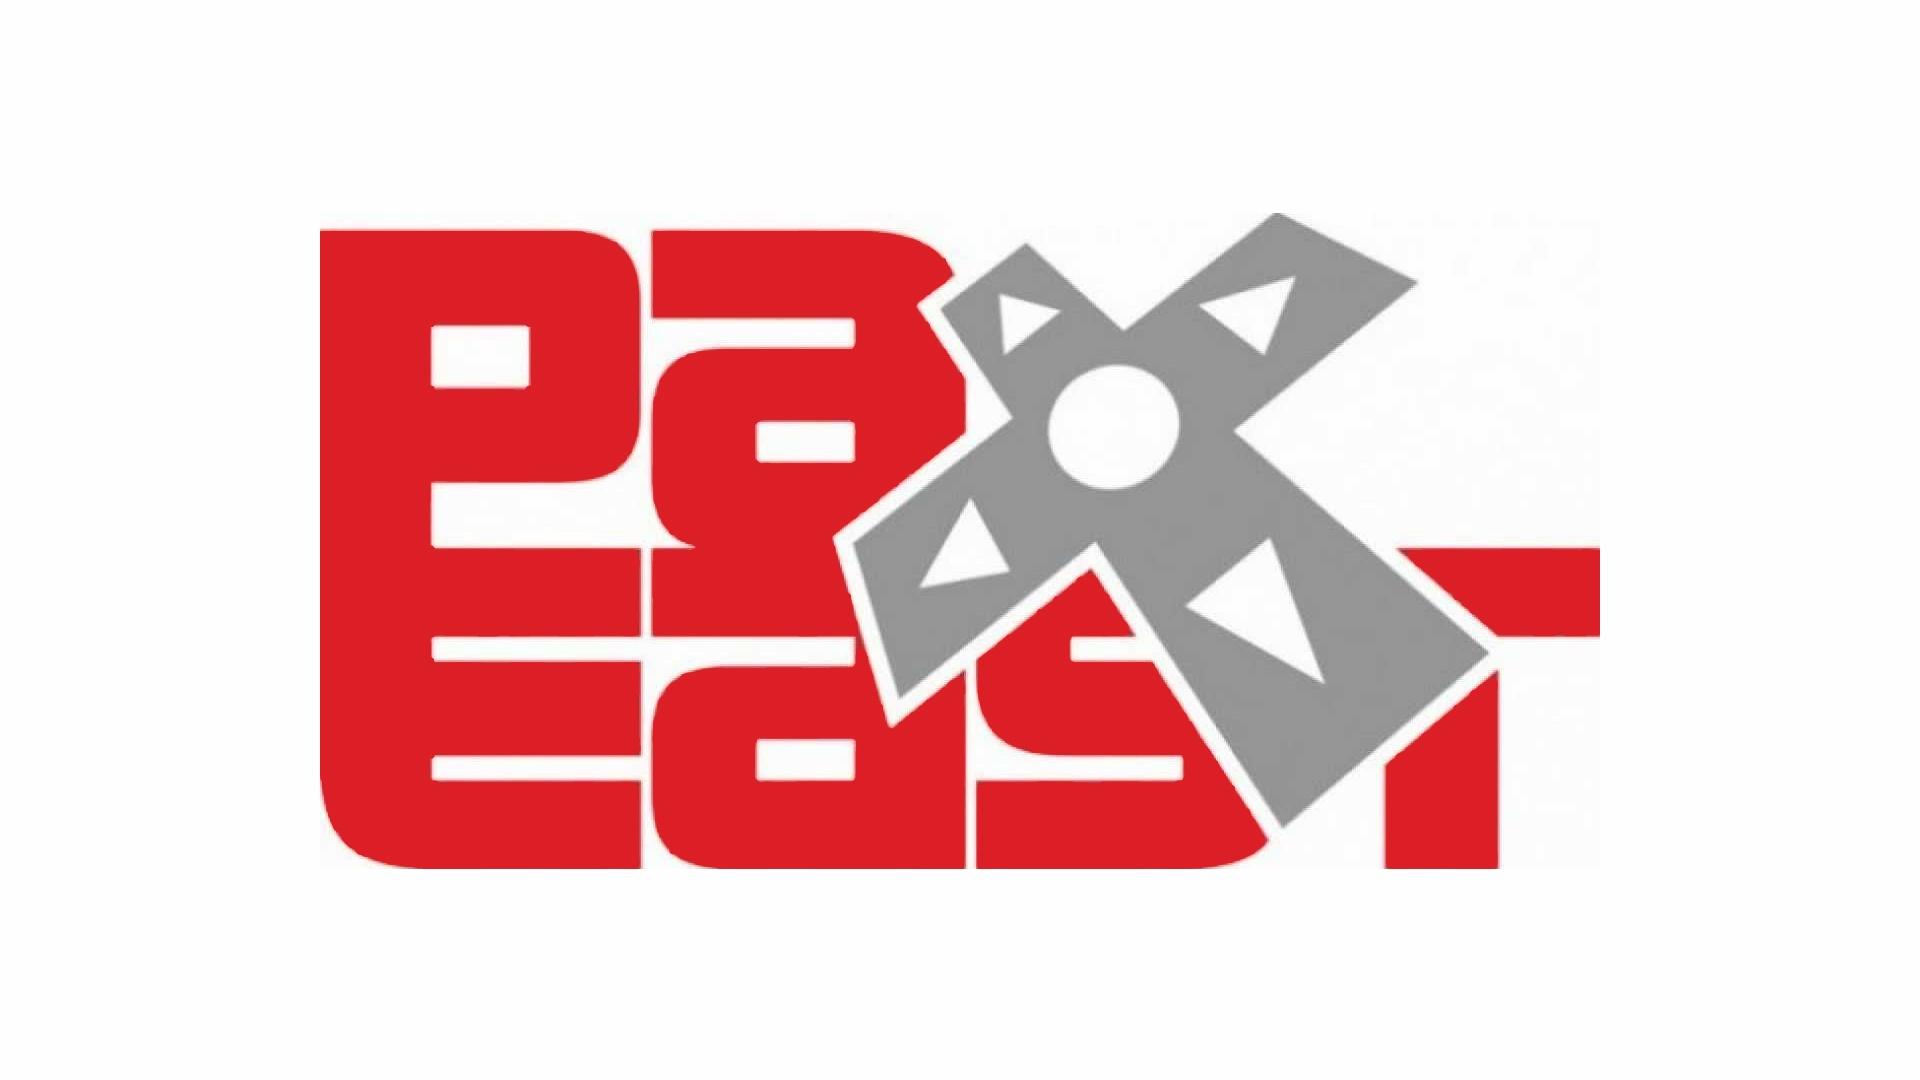 Pax East Oyunpat-oyunpat